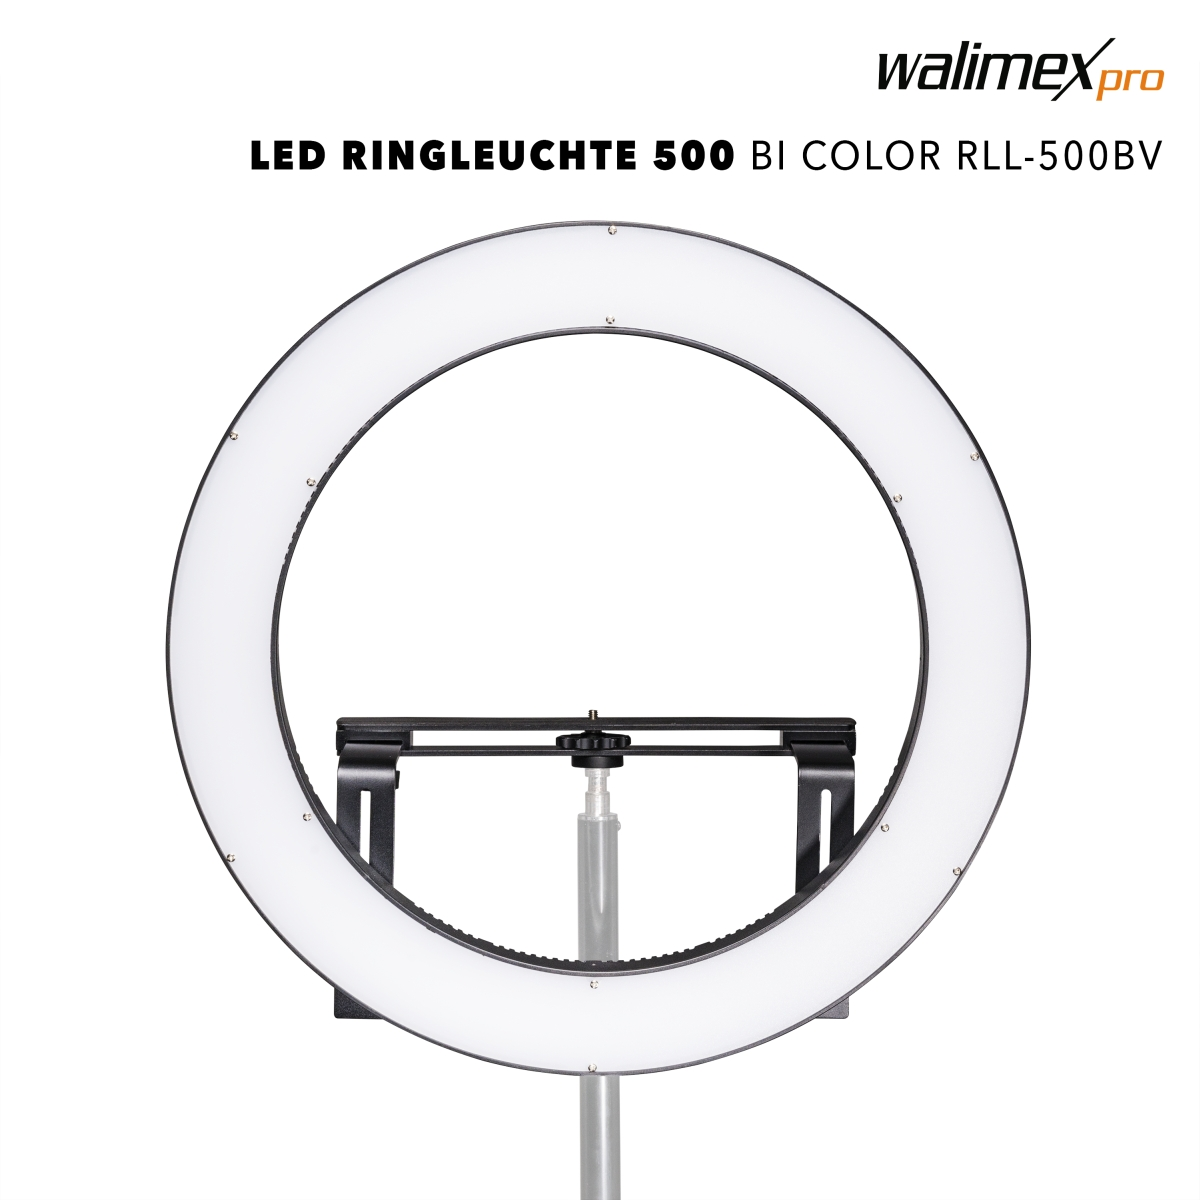 Walimex pro LED Ring Light 500 Bi Color RLL-500BV